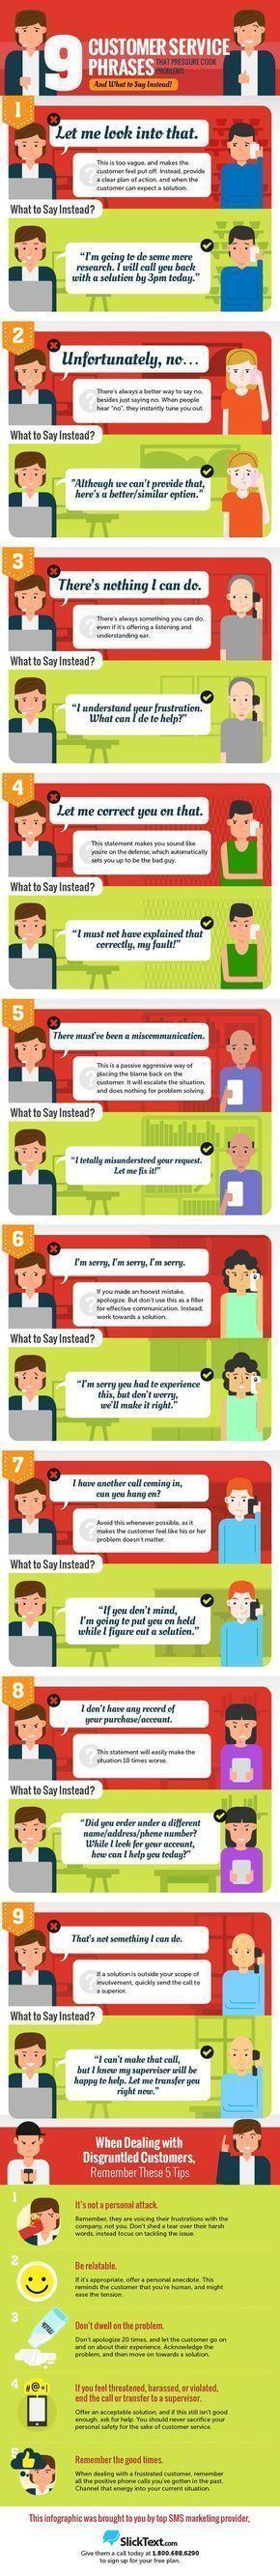 Fundraising Infographic  Fundraising Infographic  9 Customer